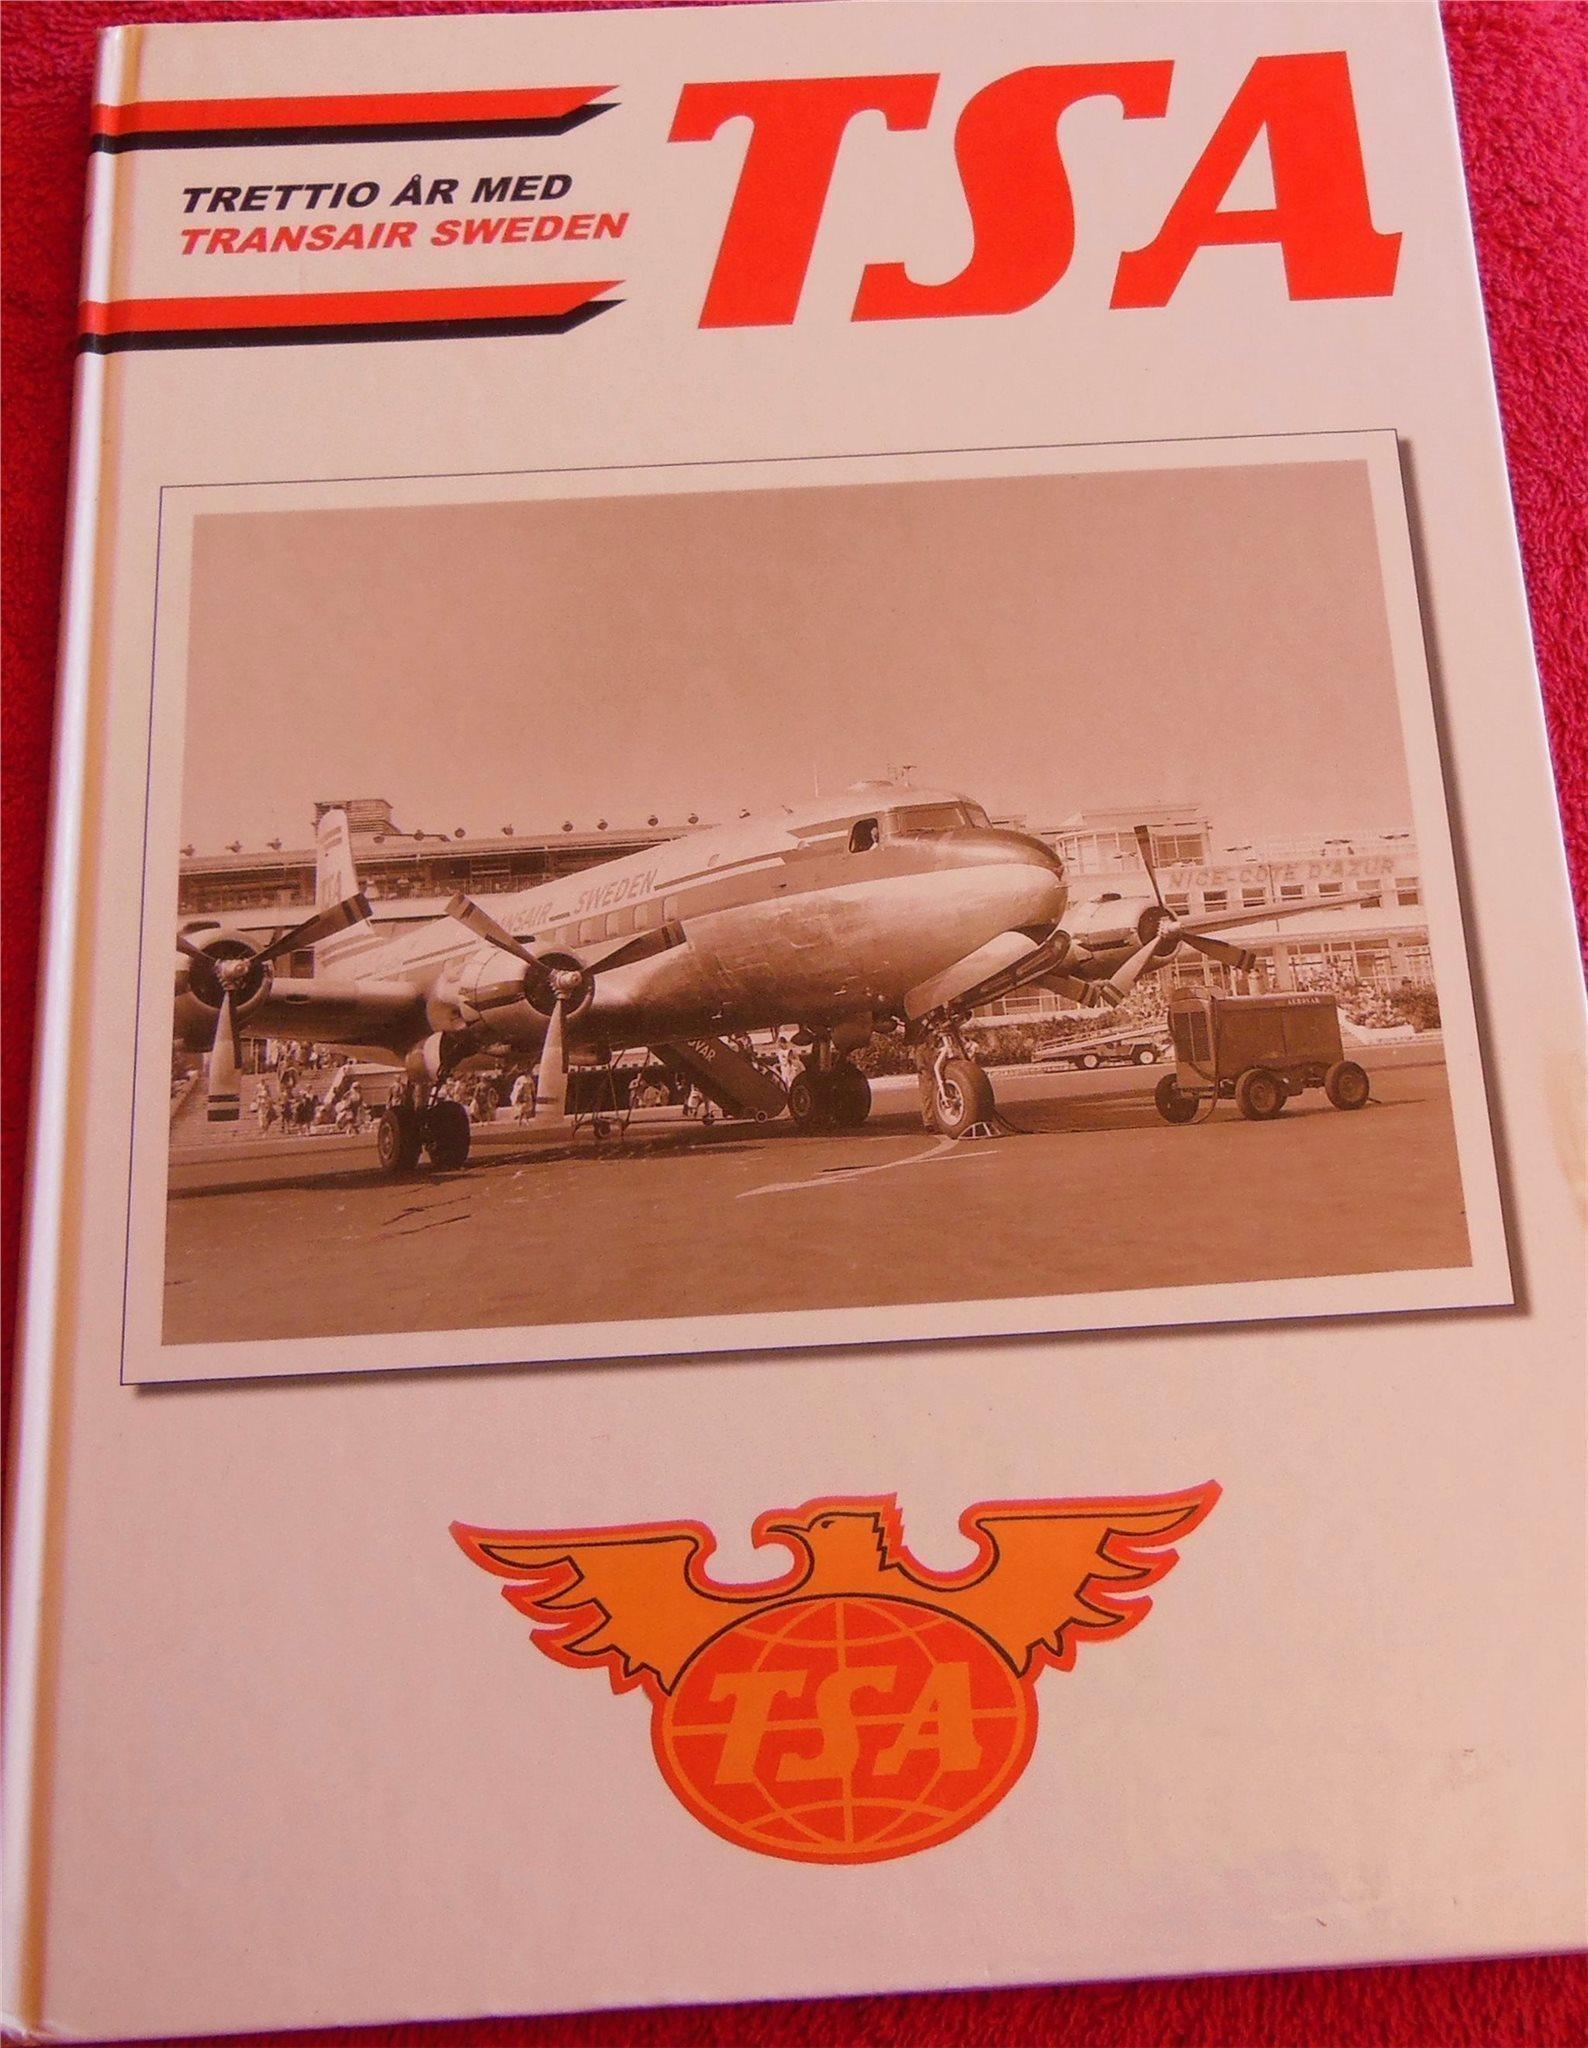 trettio år TSA Trettio år med Transair Sweden, FLYGHISTORIA (318210227) ᐈ  trettio år